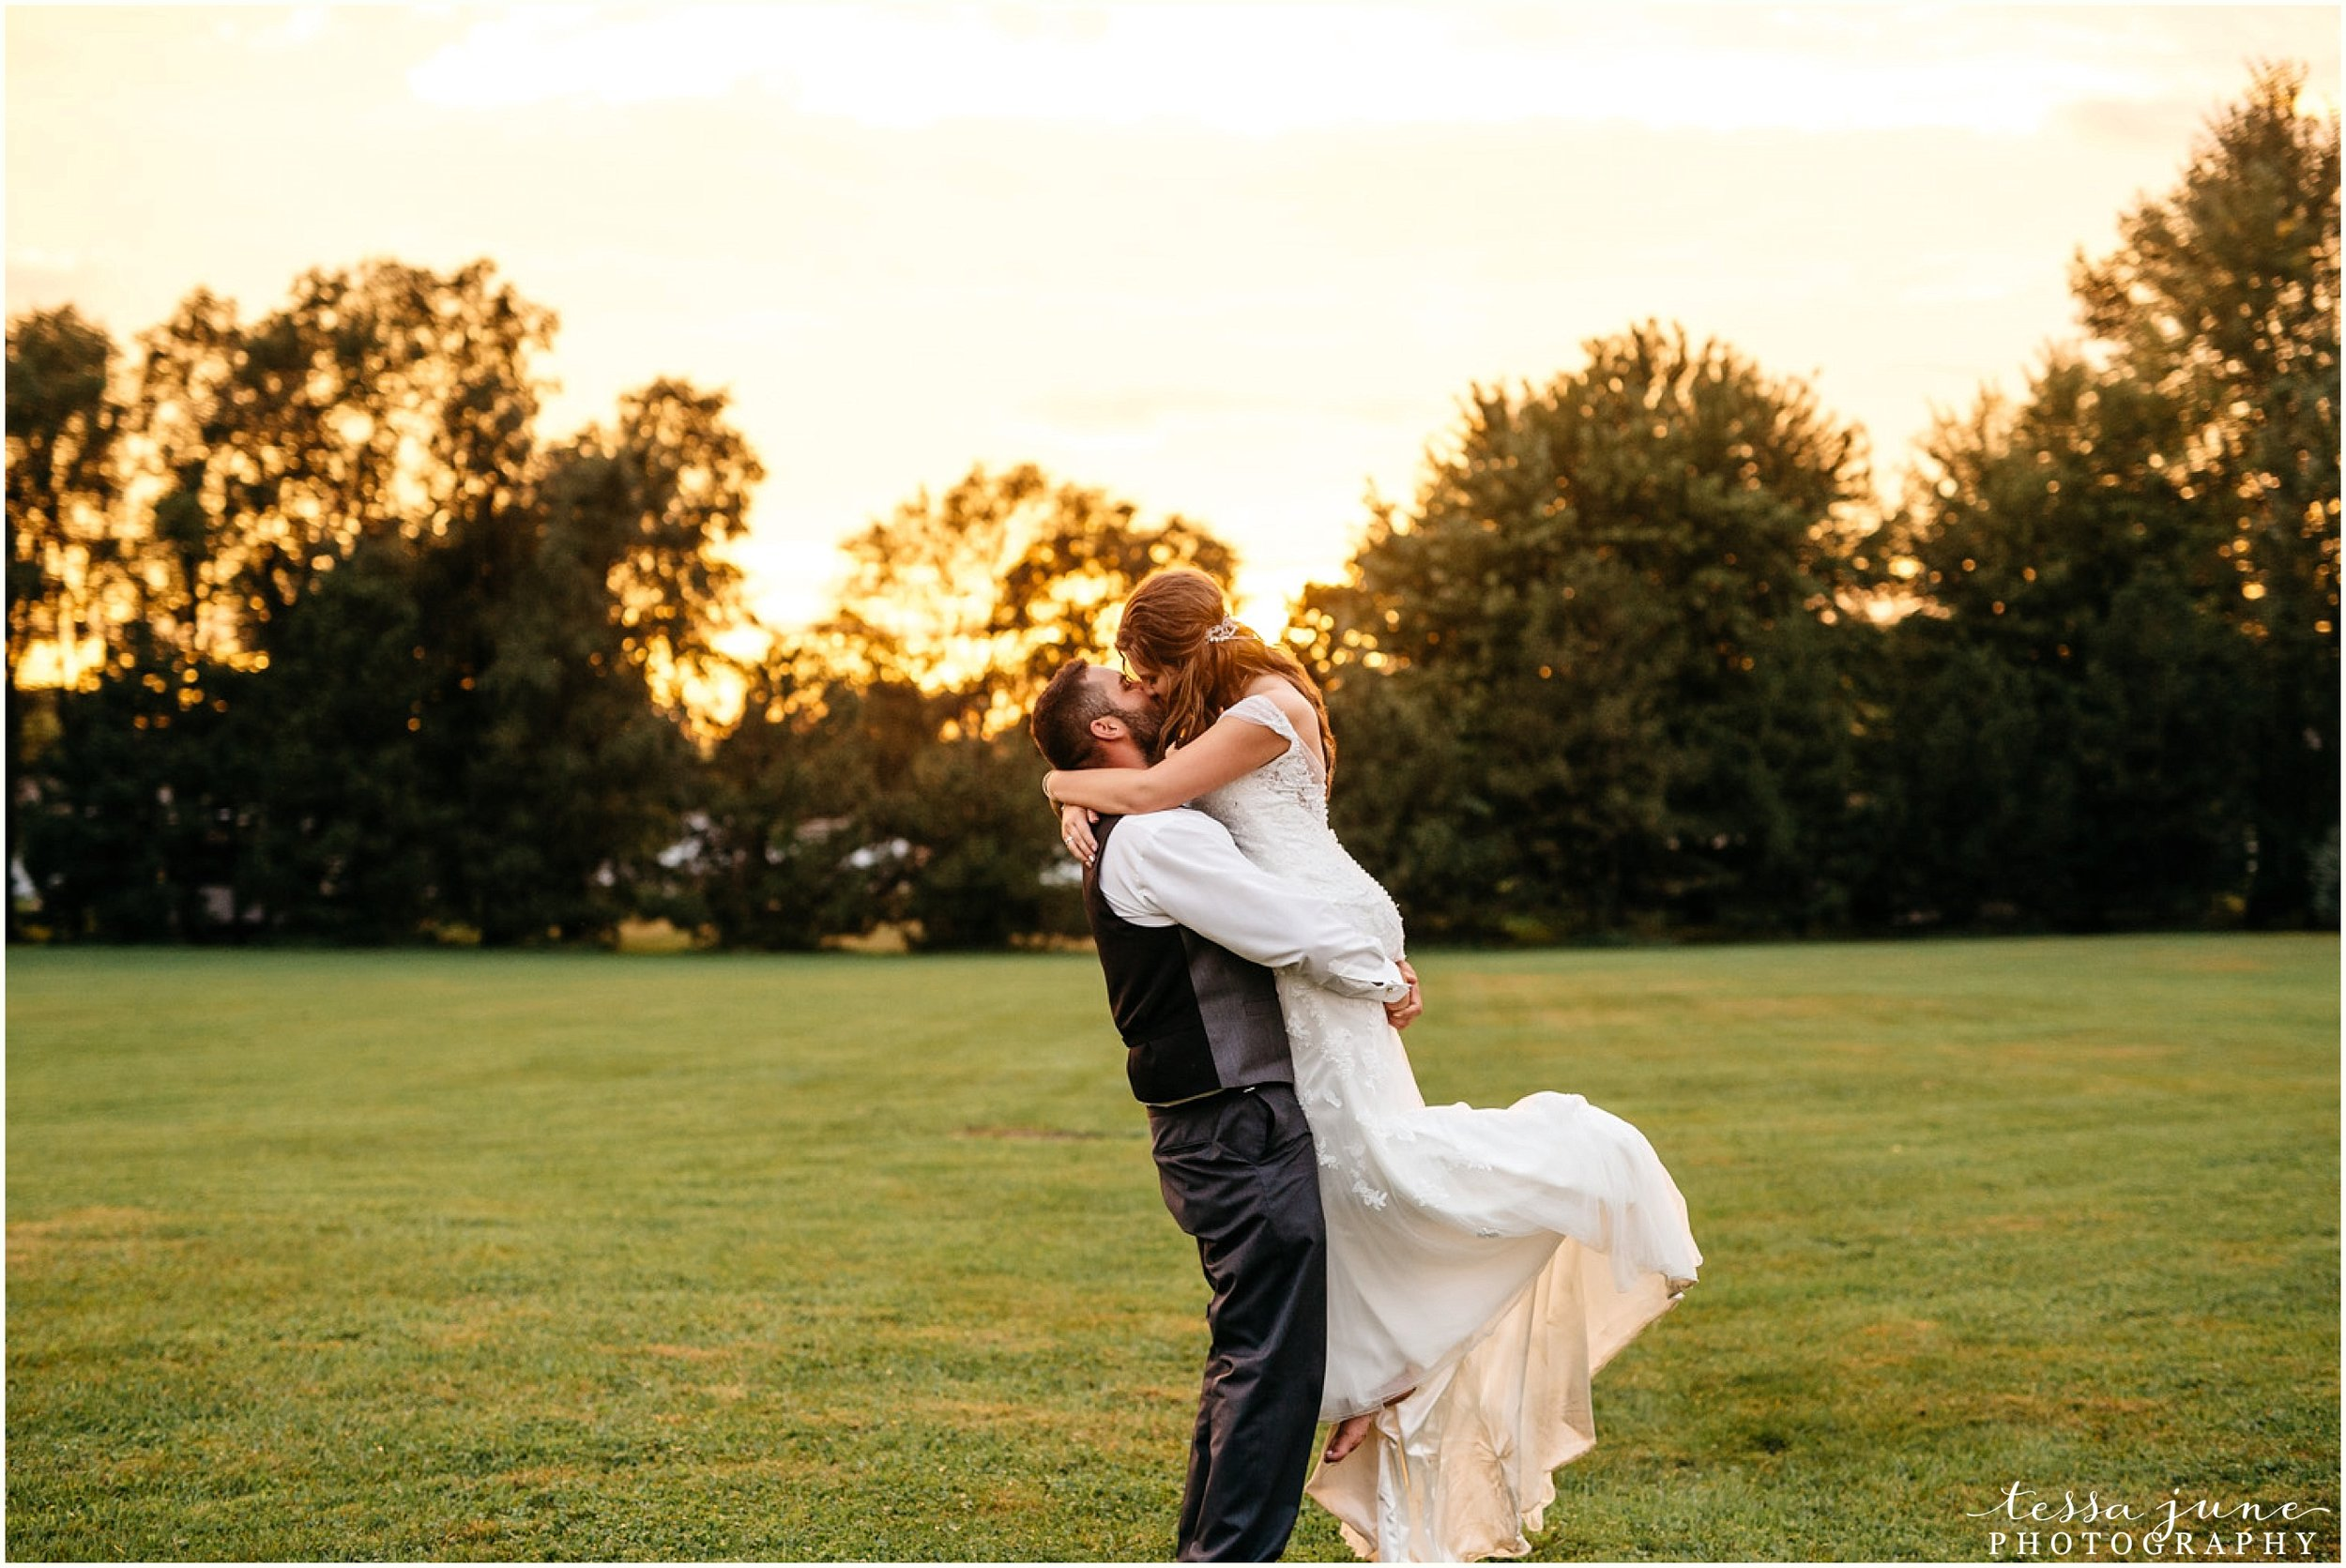 bohemian-minnesota-wedding-mismatched-bridesmaid-dresses-waterfall-st-cloud-tessa-june-photography-189.jpg